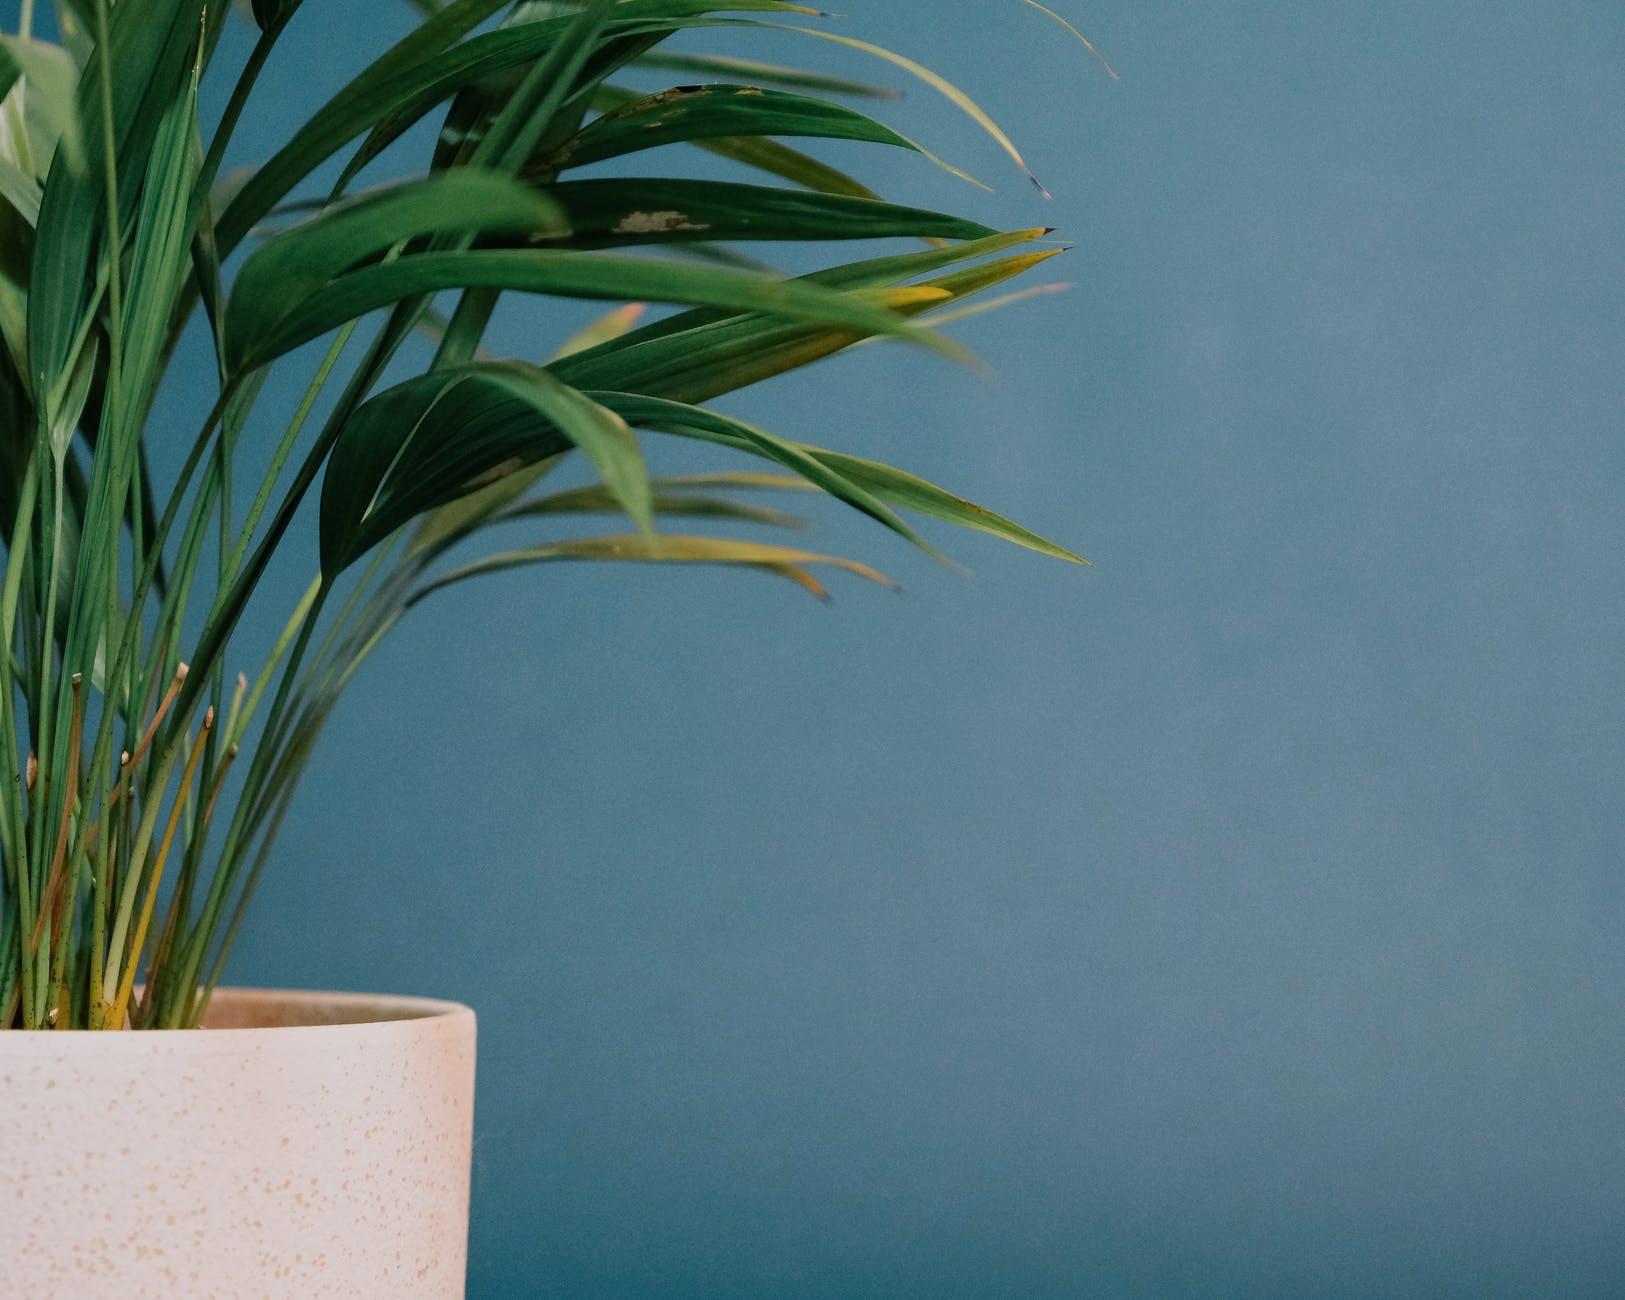 green howea plant on blue background